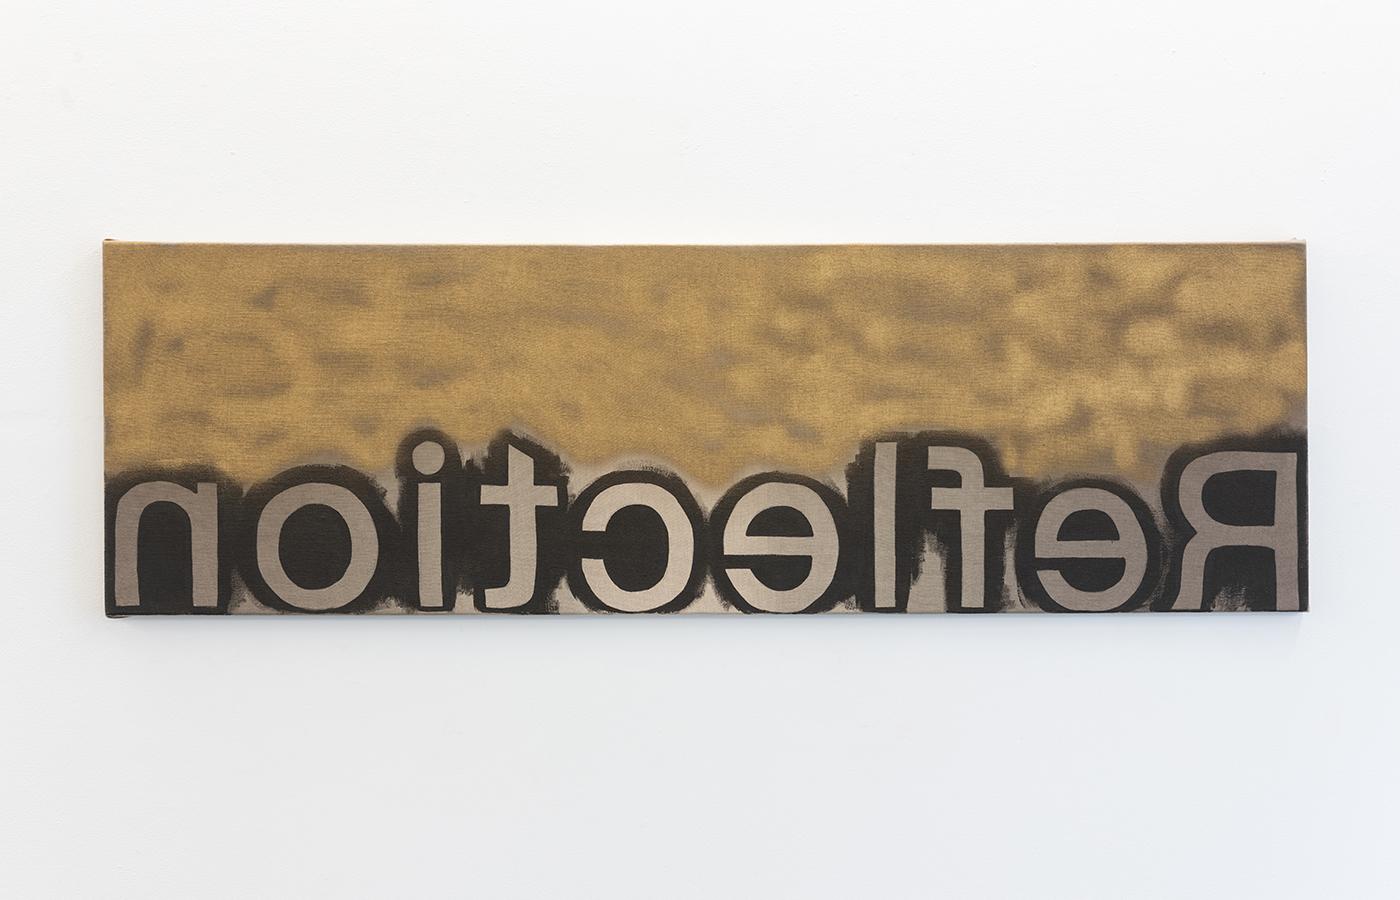 camila-oliveira-fairclough-10